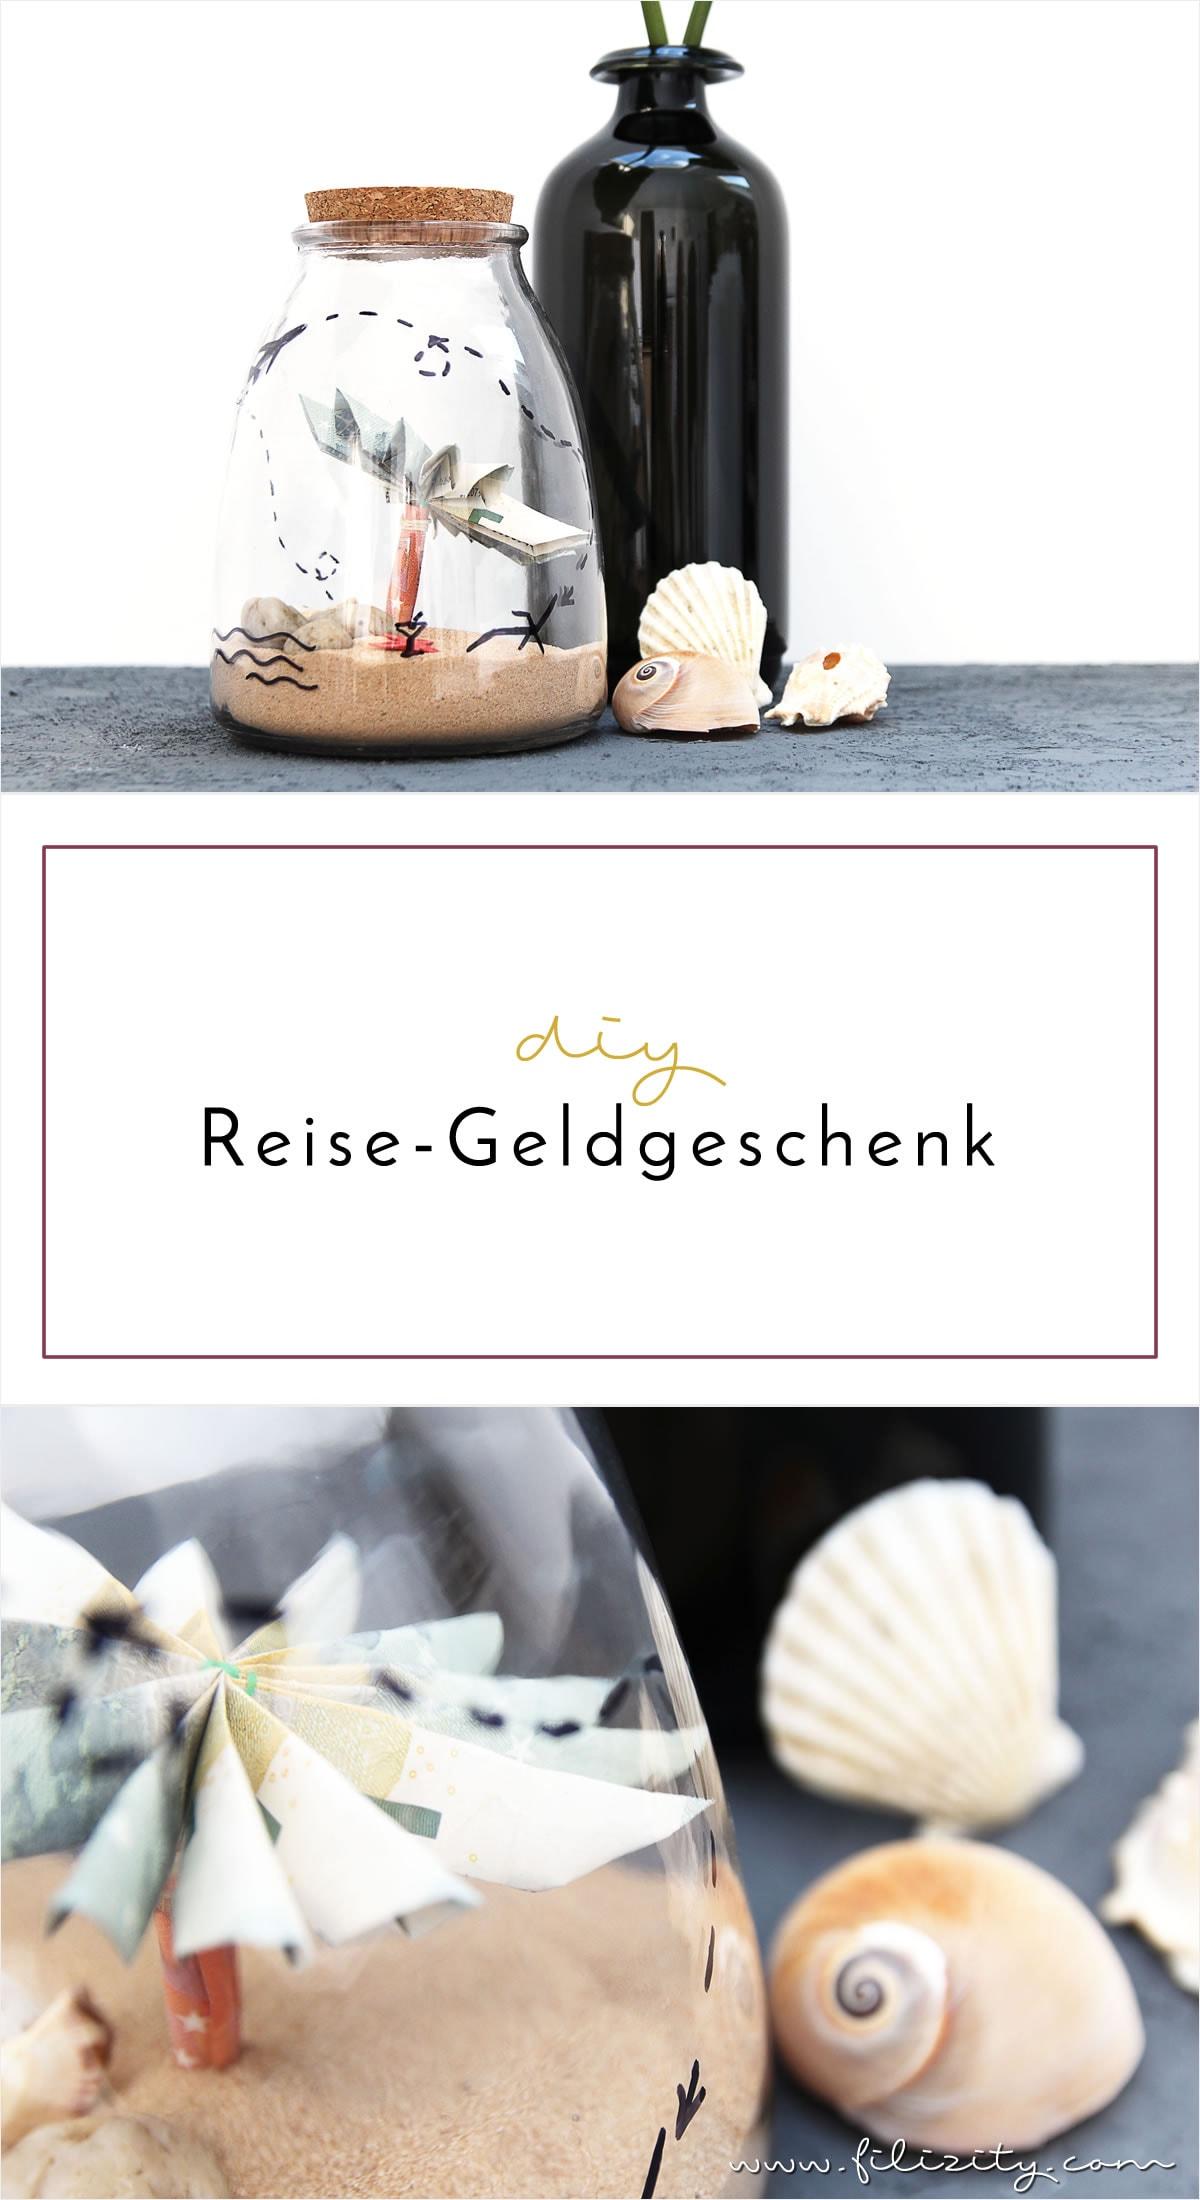 Kreative Verpackung Fur Reise Geldgeschenke Filizity Com